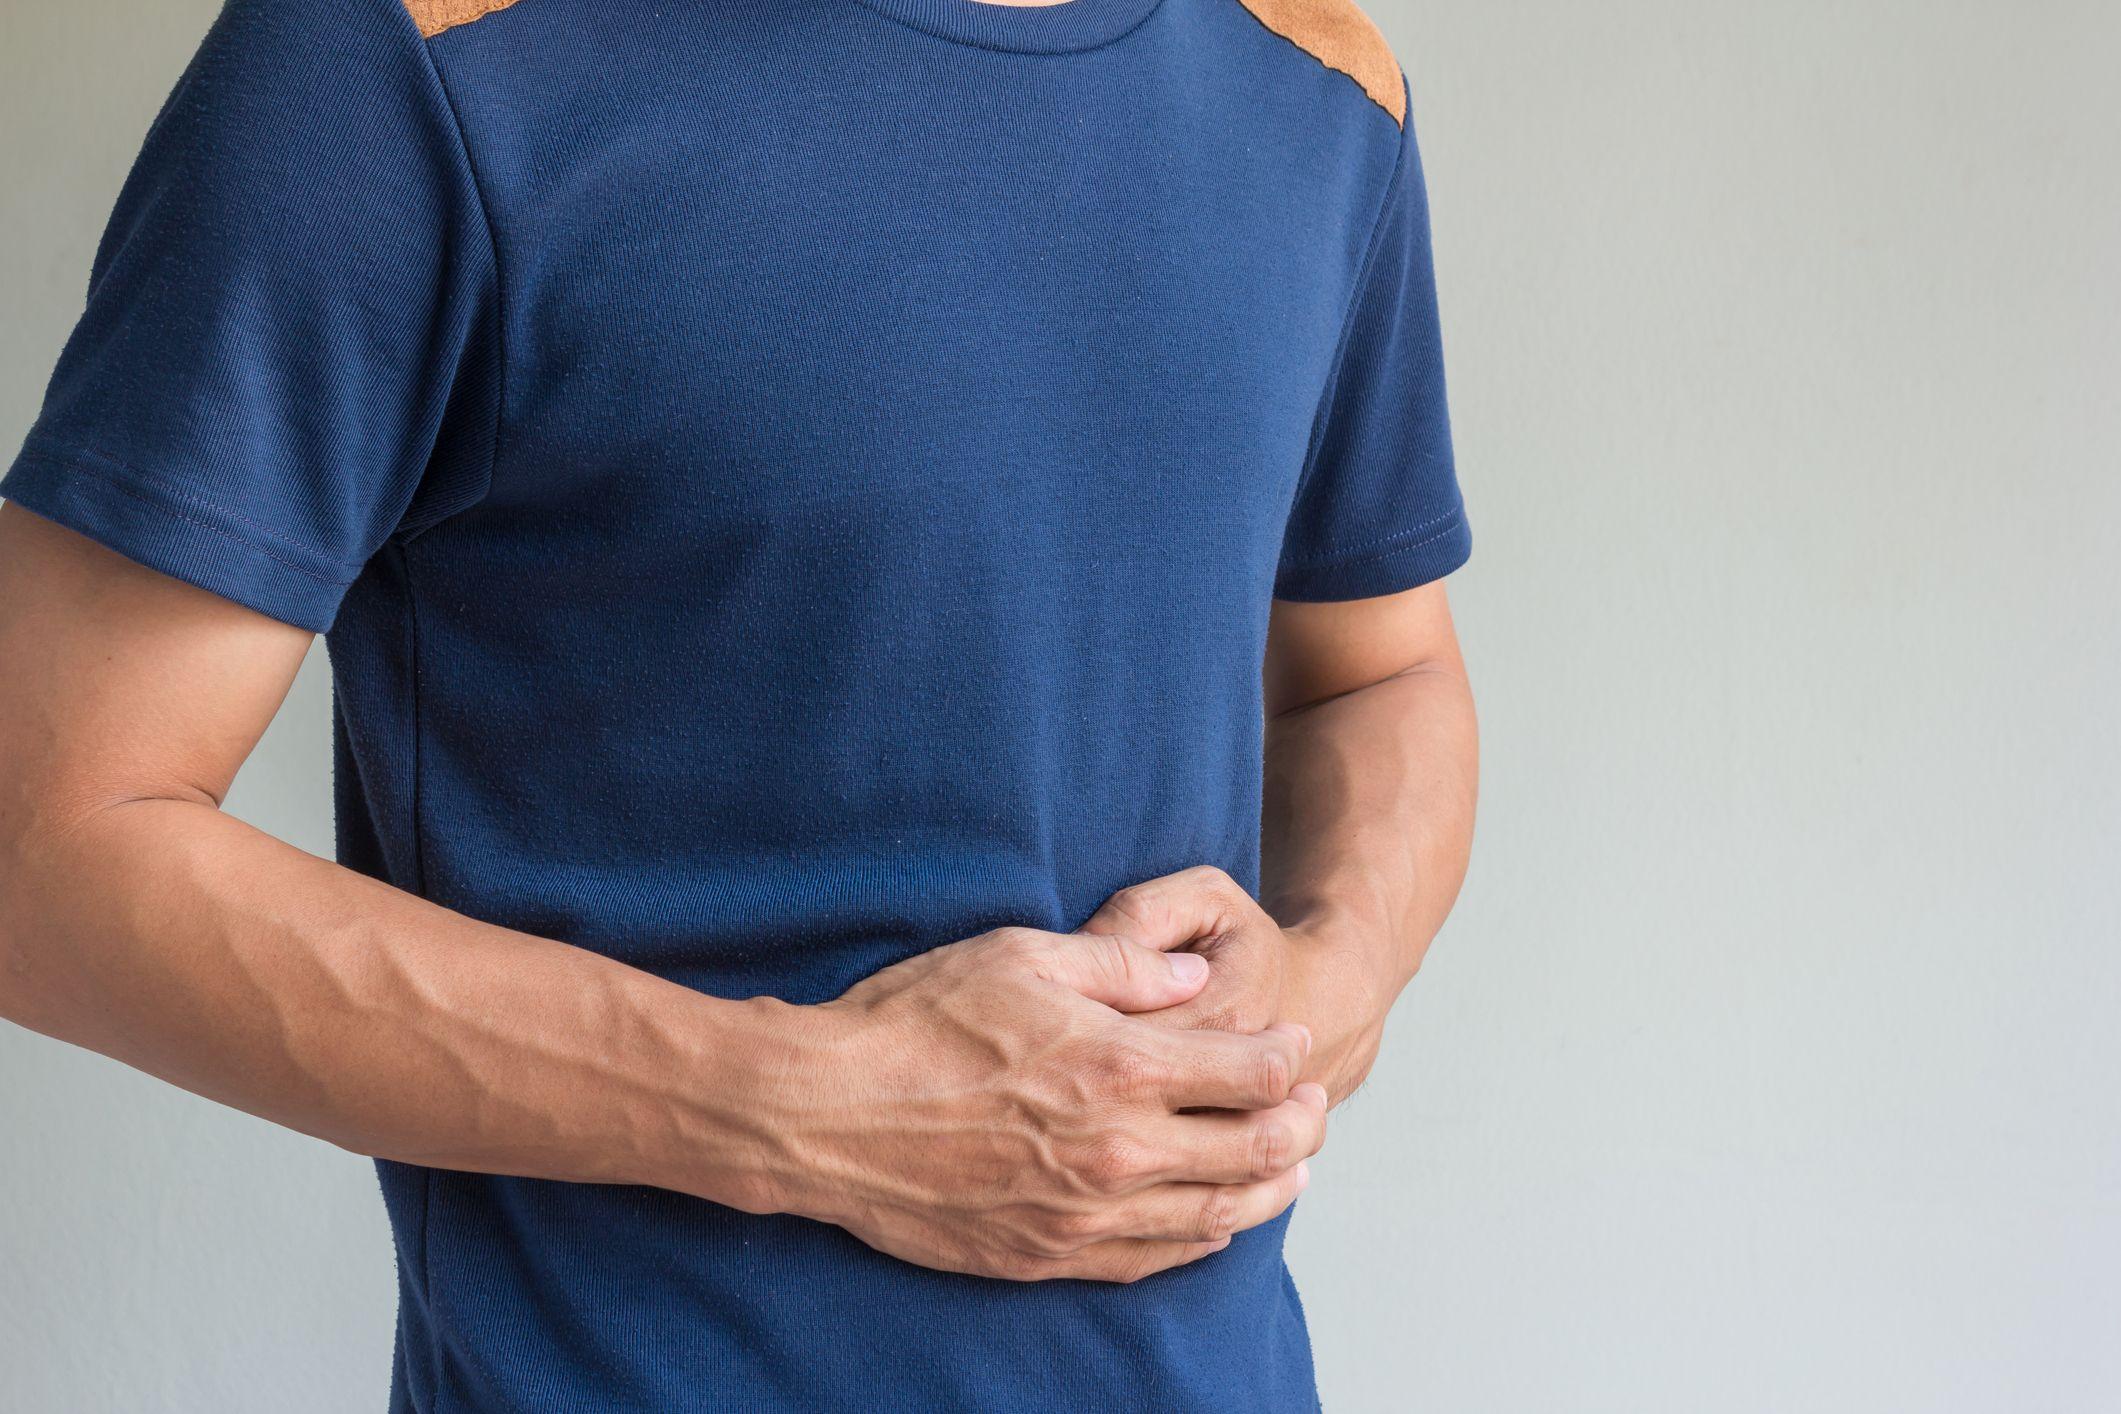 stomach-bowel-man-stock